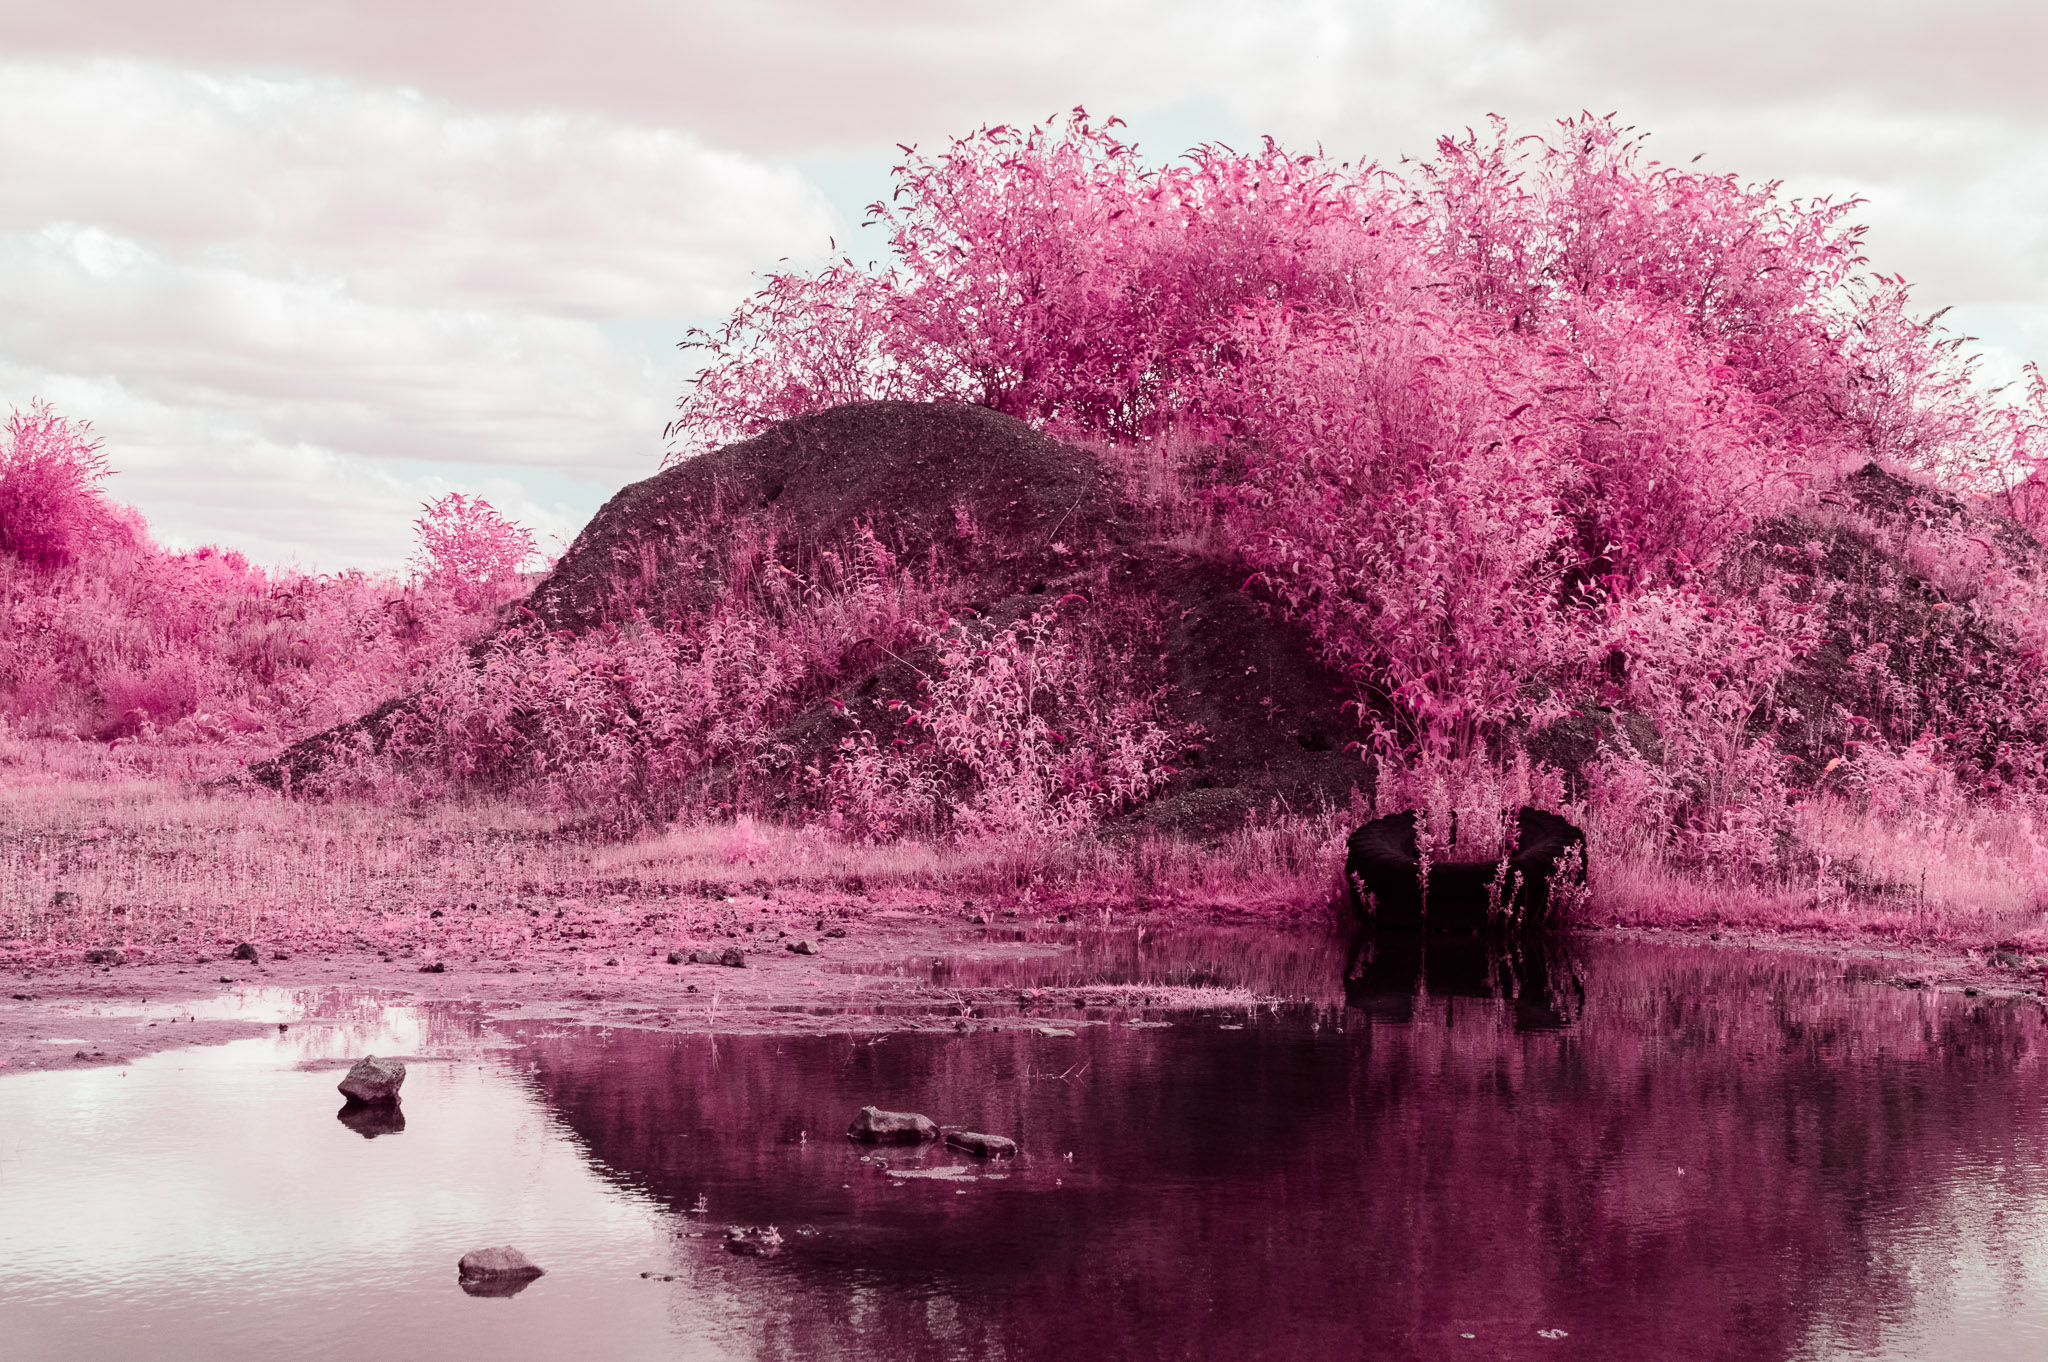 Kodak EIR Colour Infrared, Edgelands, Wasteland, Tyre, Puddle ©Jonny Sutton